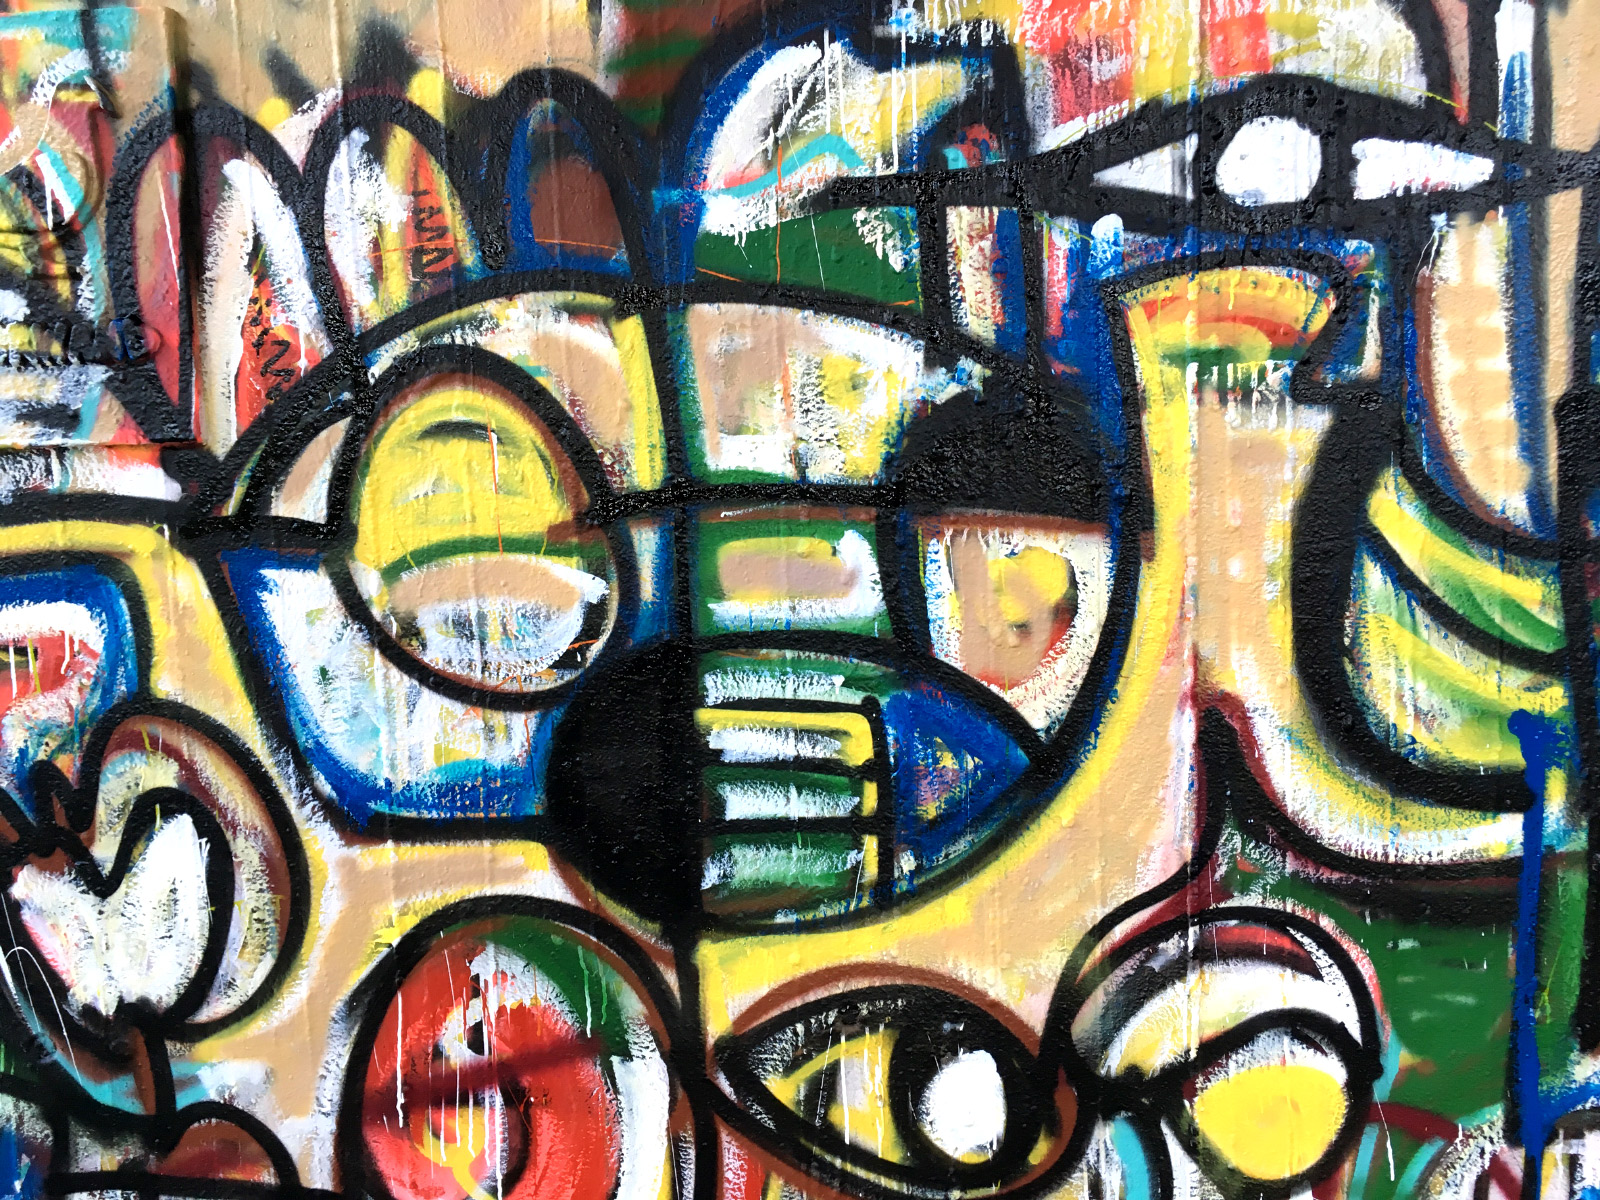 Rob_Adalierd_Painting_Vienna_Abstract_Contemporary_Street_art_7.jpg